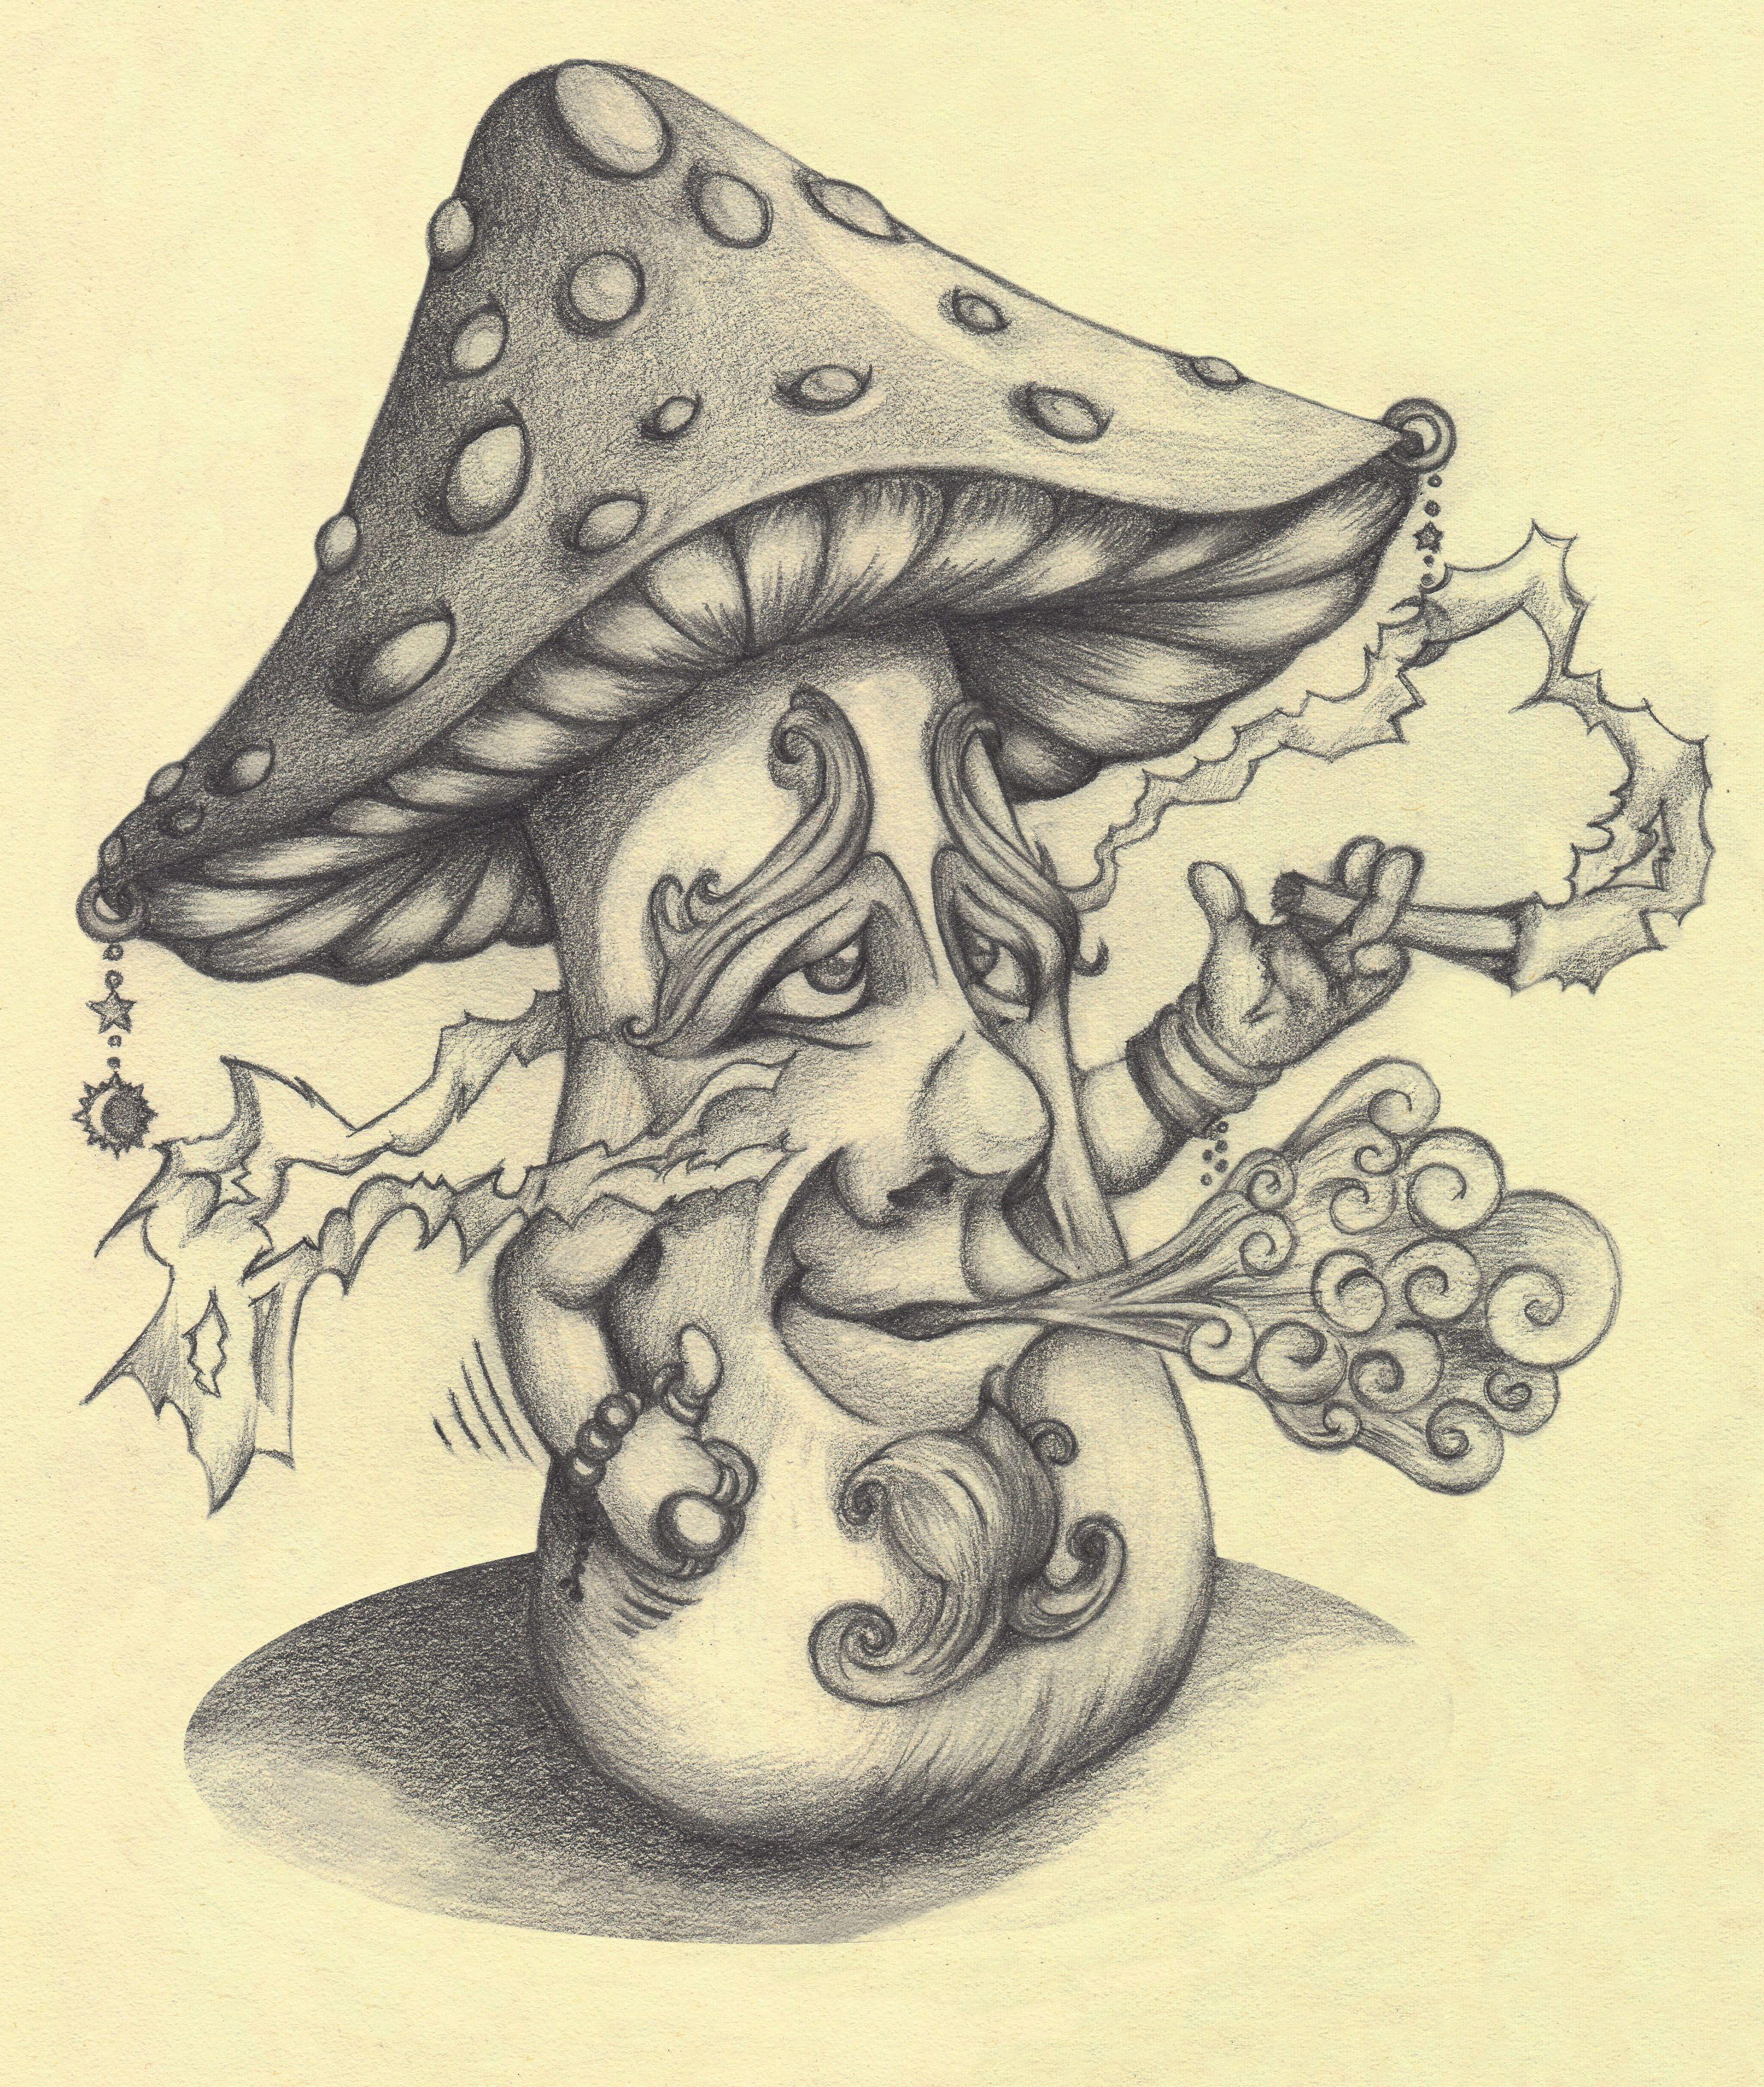 Magic mushrooms draw | Design | Pinterest | Mushroom drawing